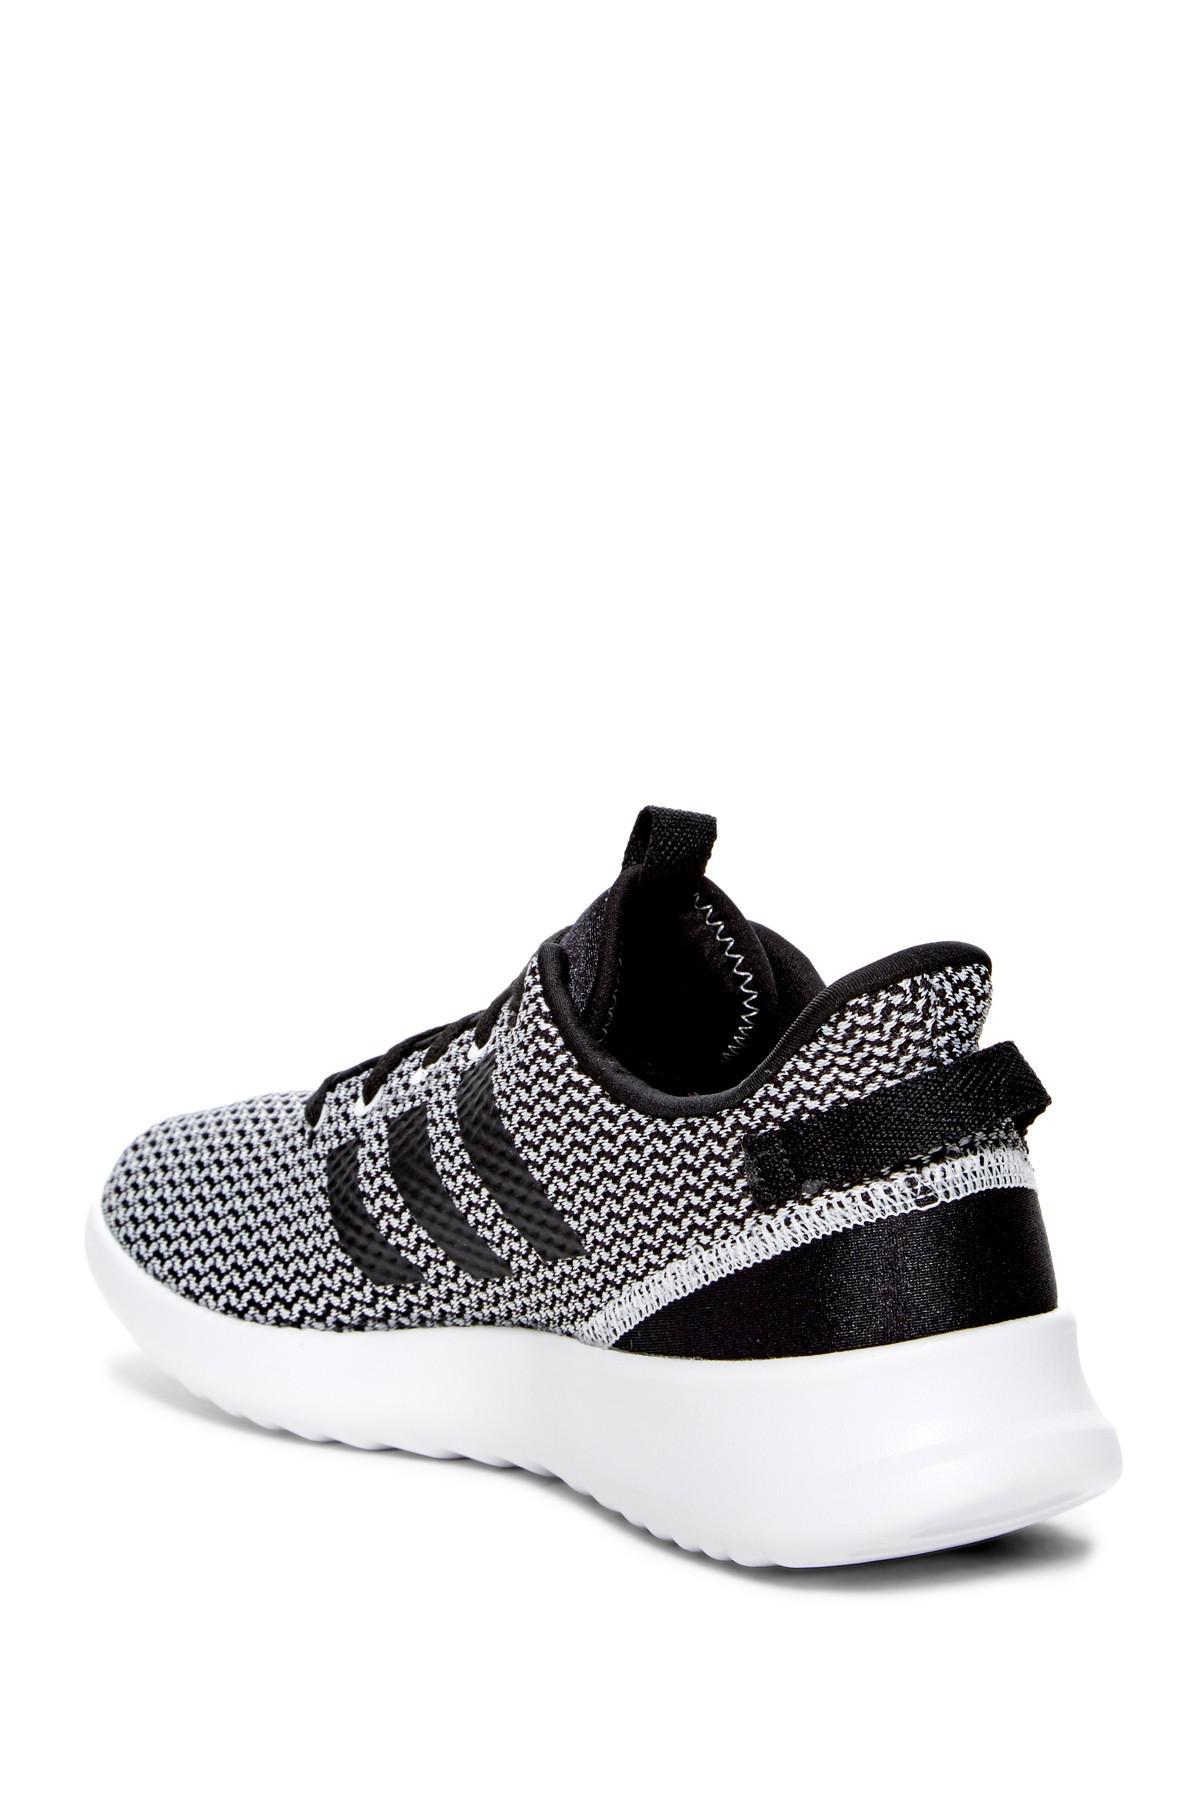 lyst adidas cloudfoam racer tracce in scarpe da ginnastica in nero per gli uomini.